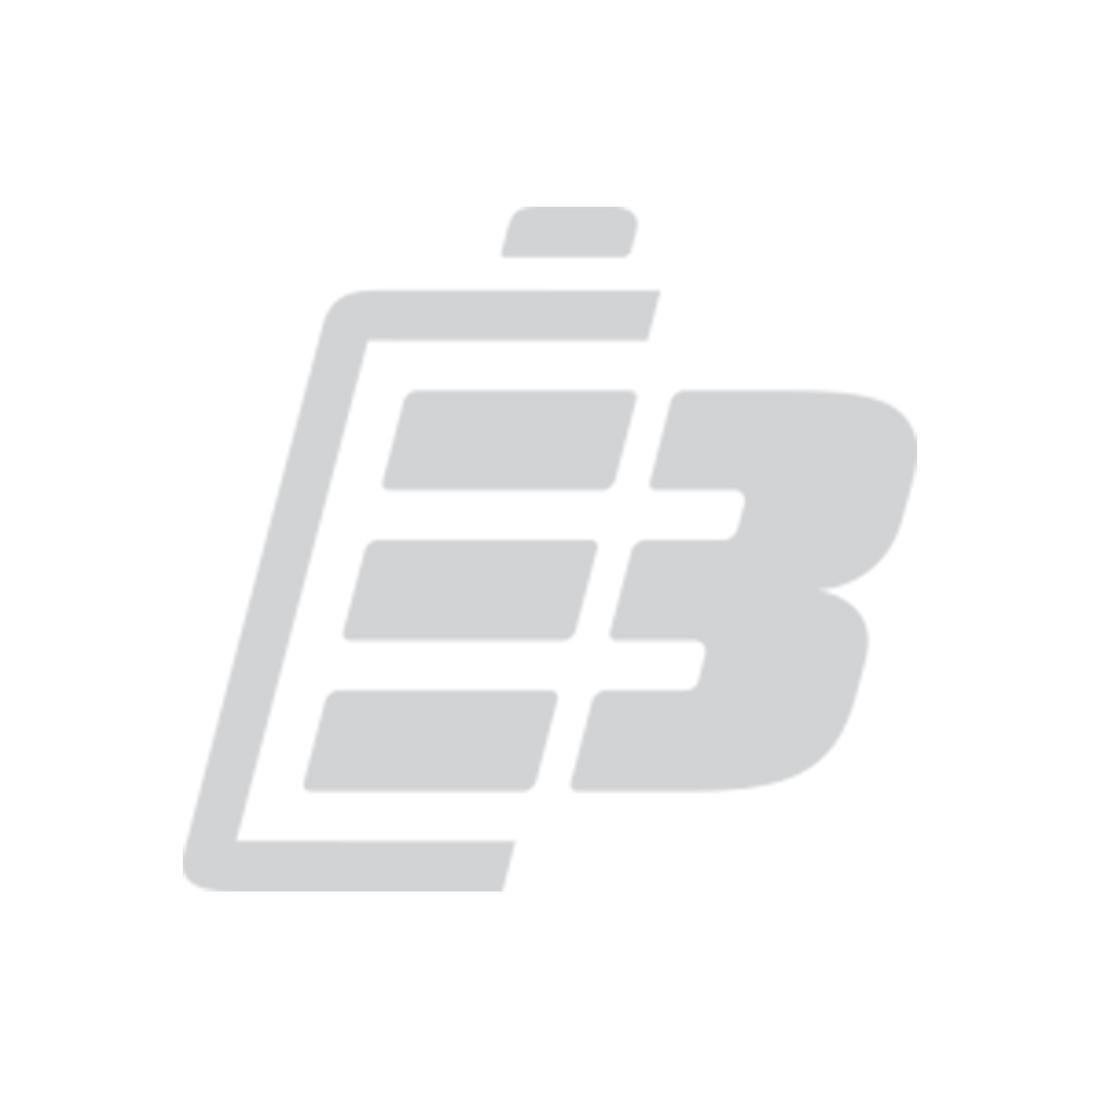 Barcode scanner battery Datalogic Falcon 4420_1